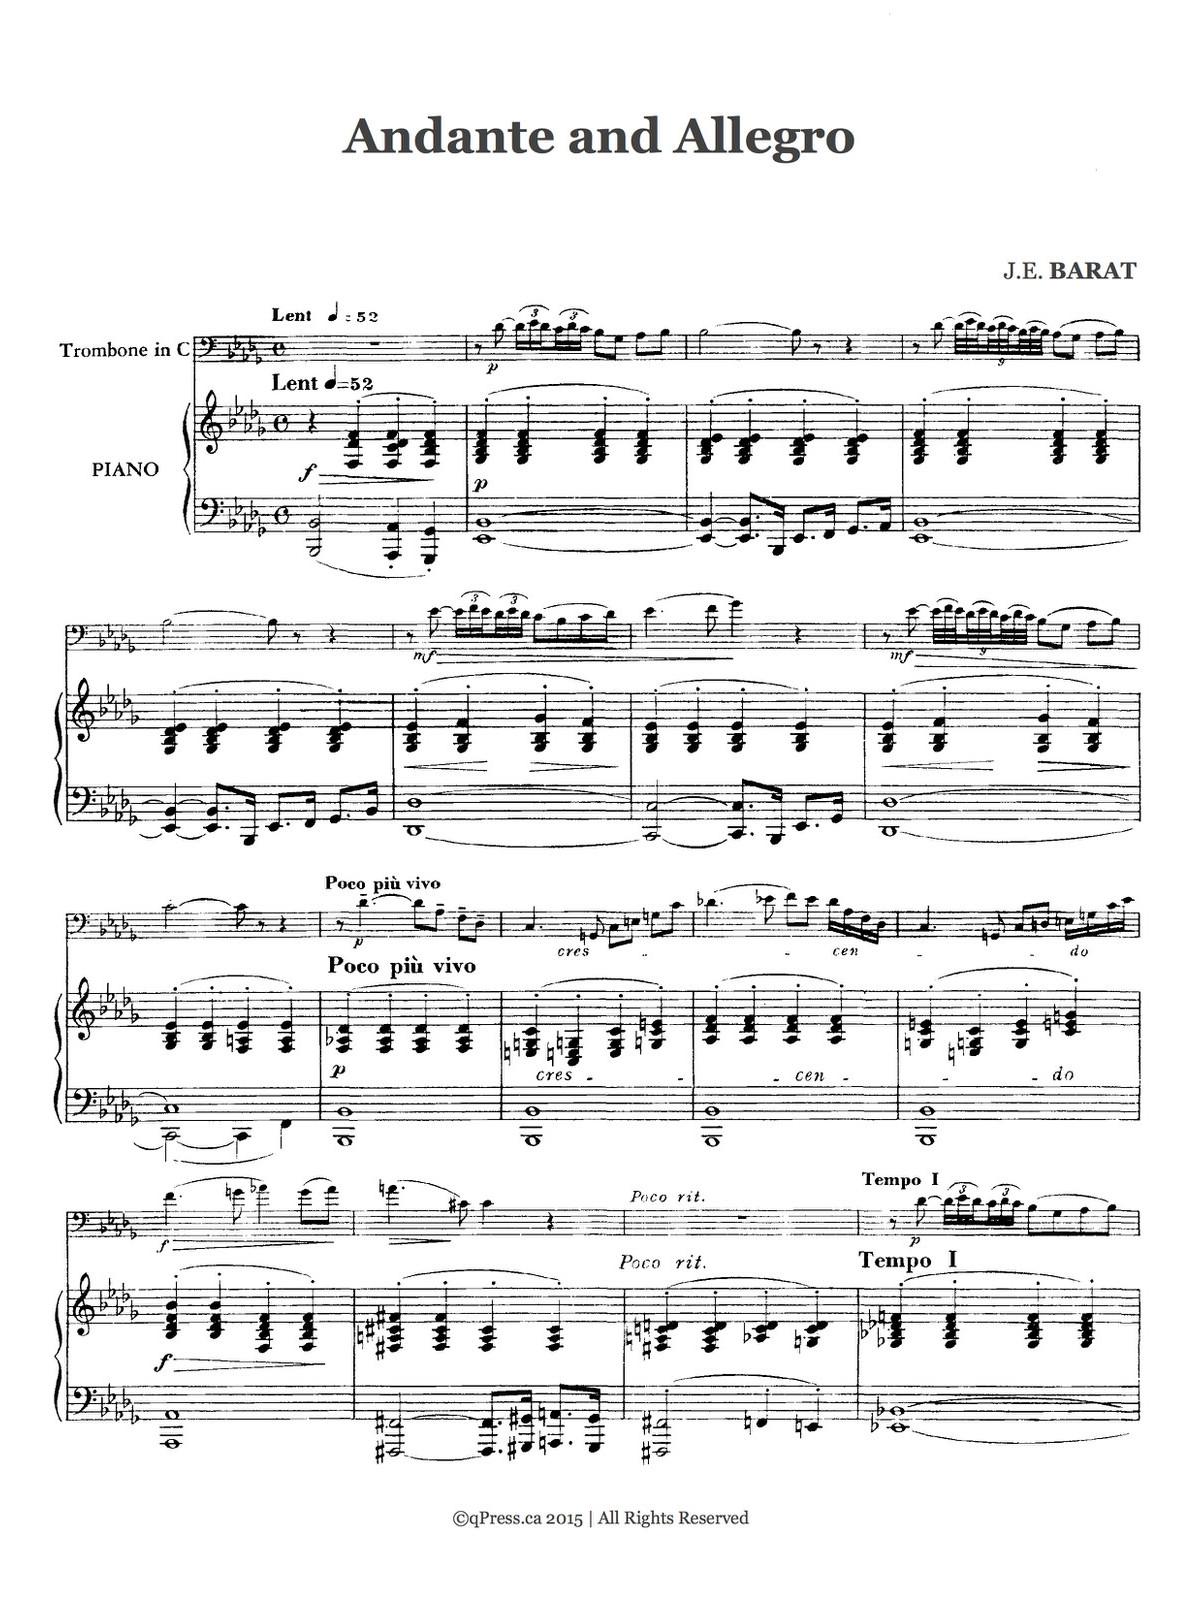 Barat, Andante and Allegro 3